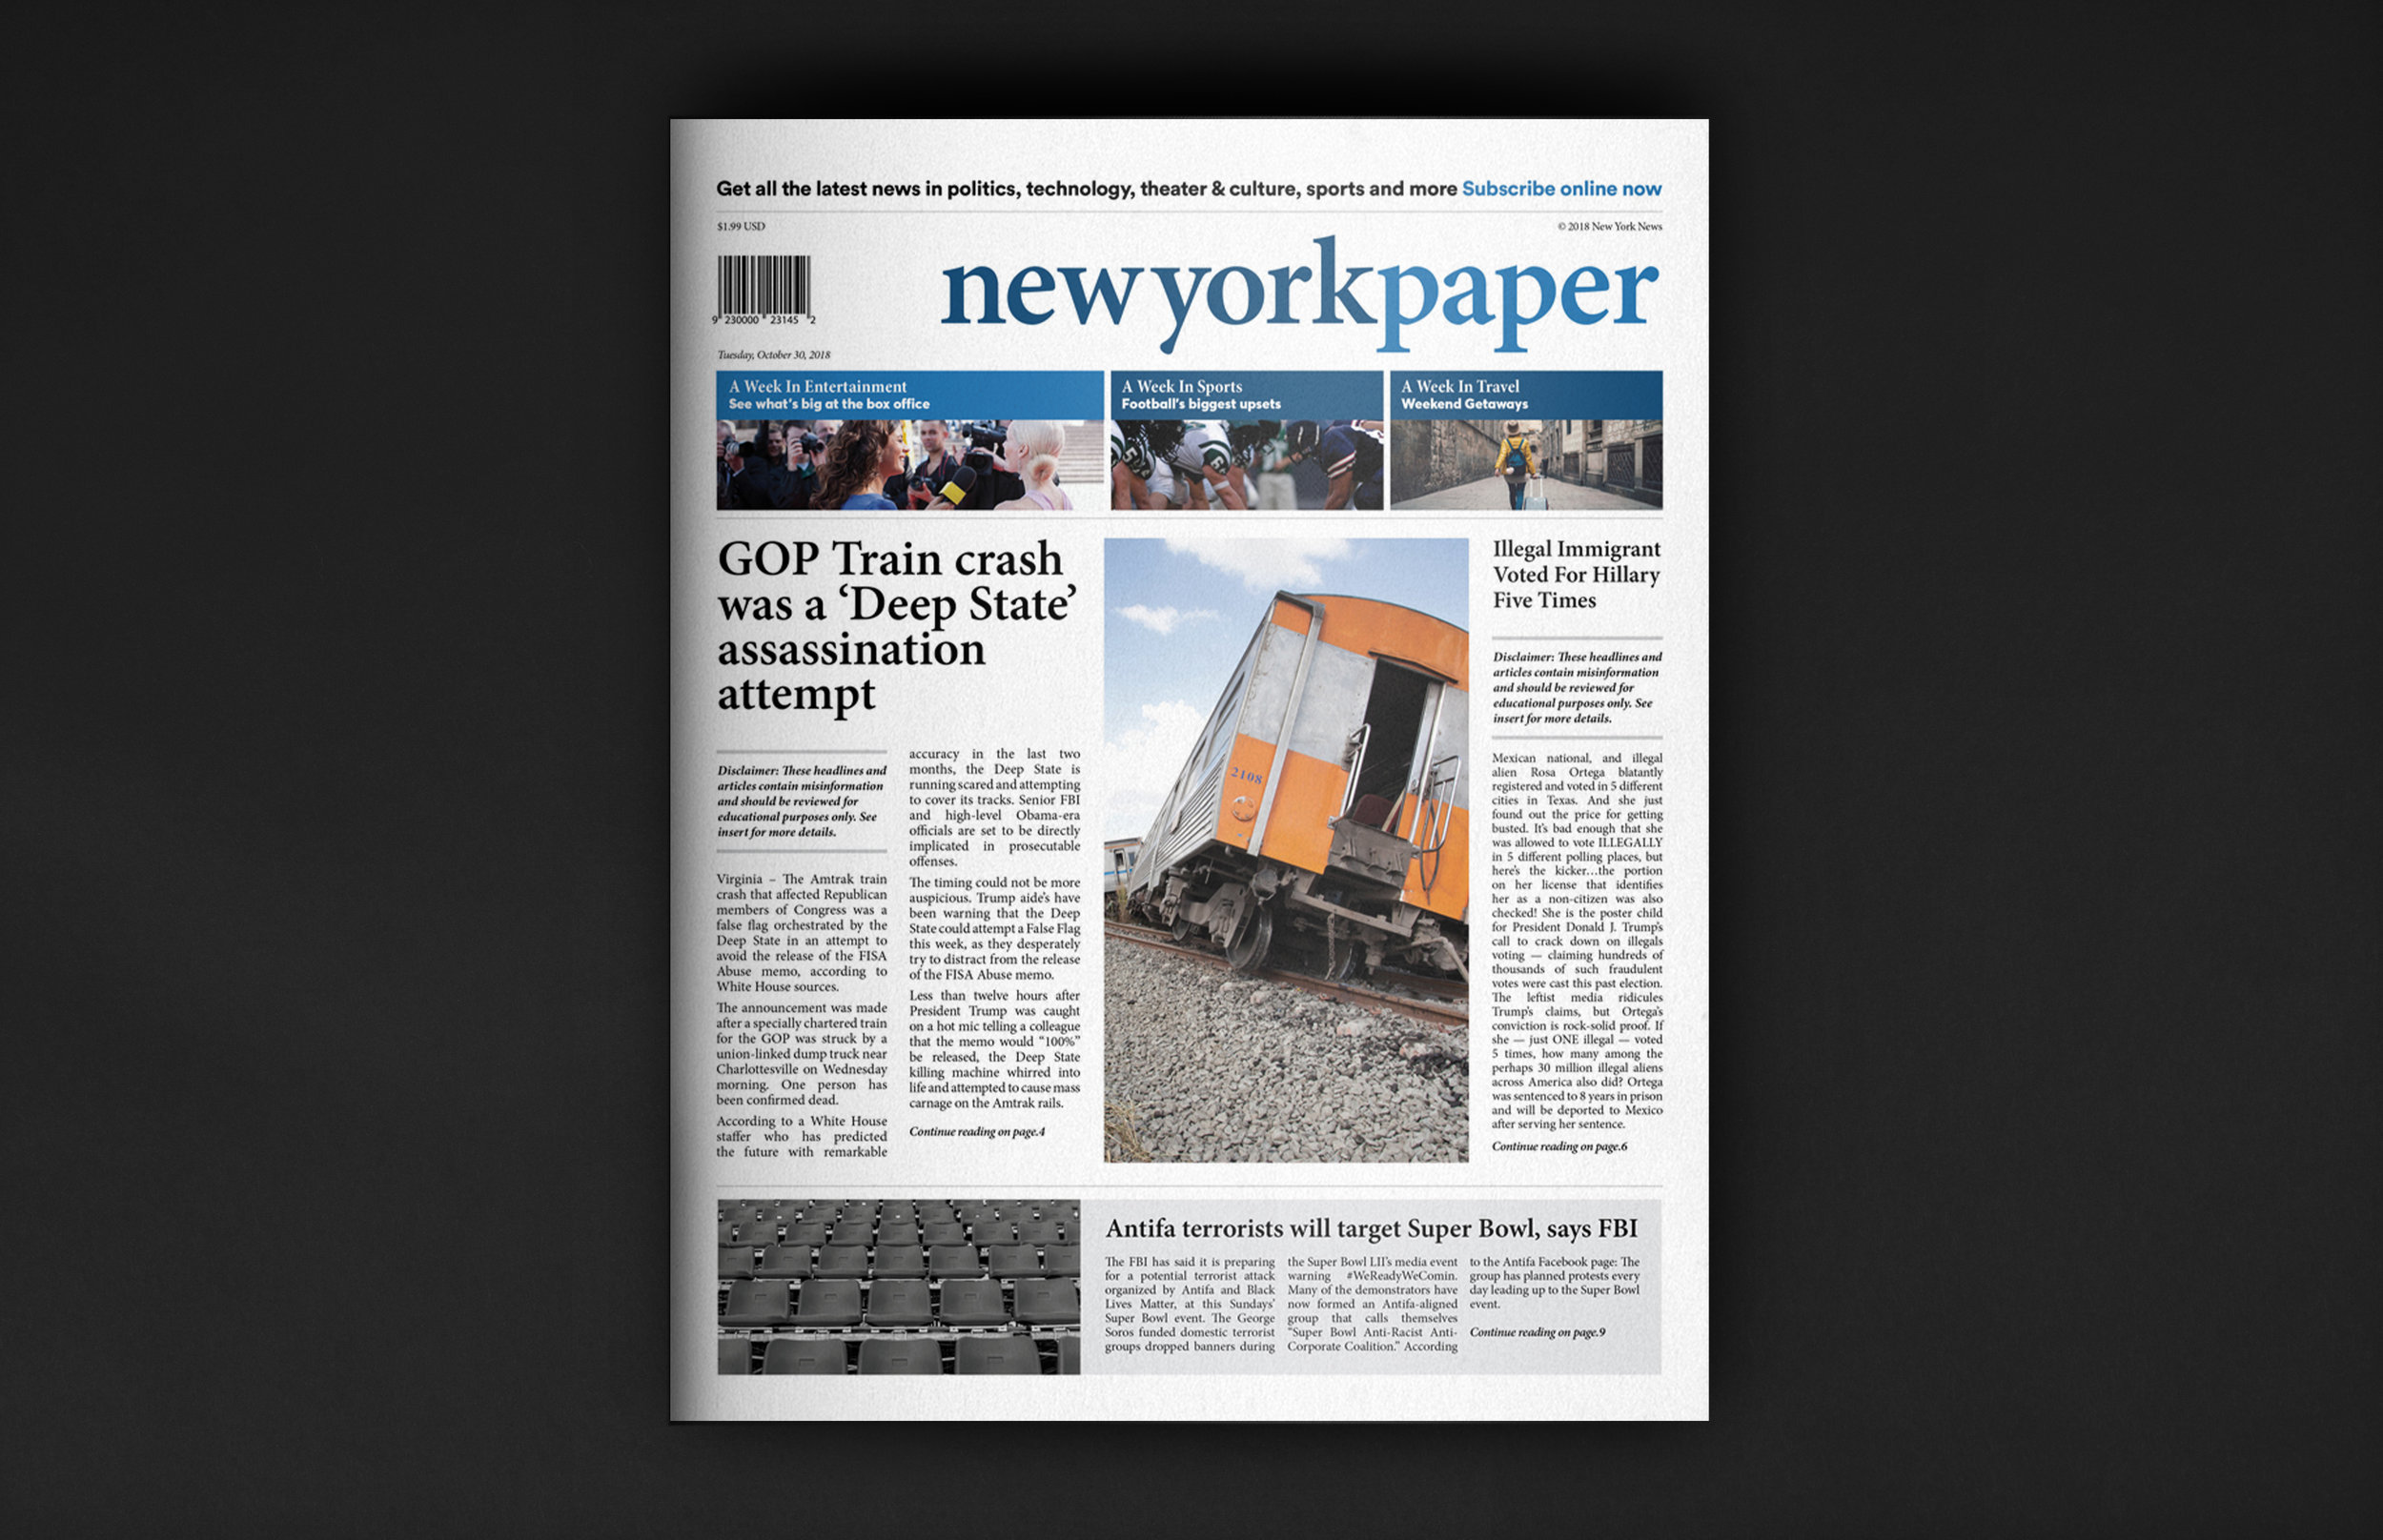 CJR-FakeNewsStand-19.jpg